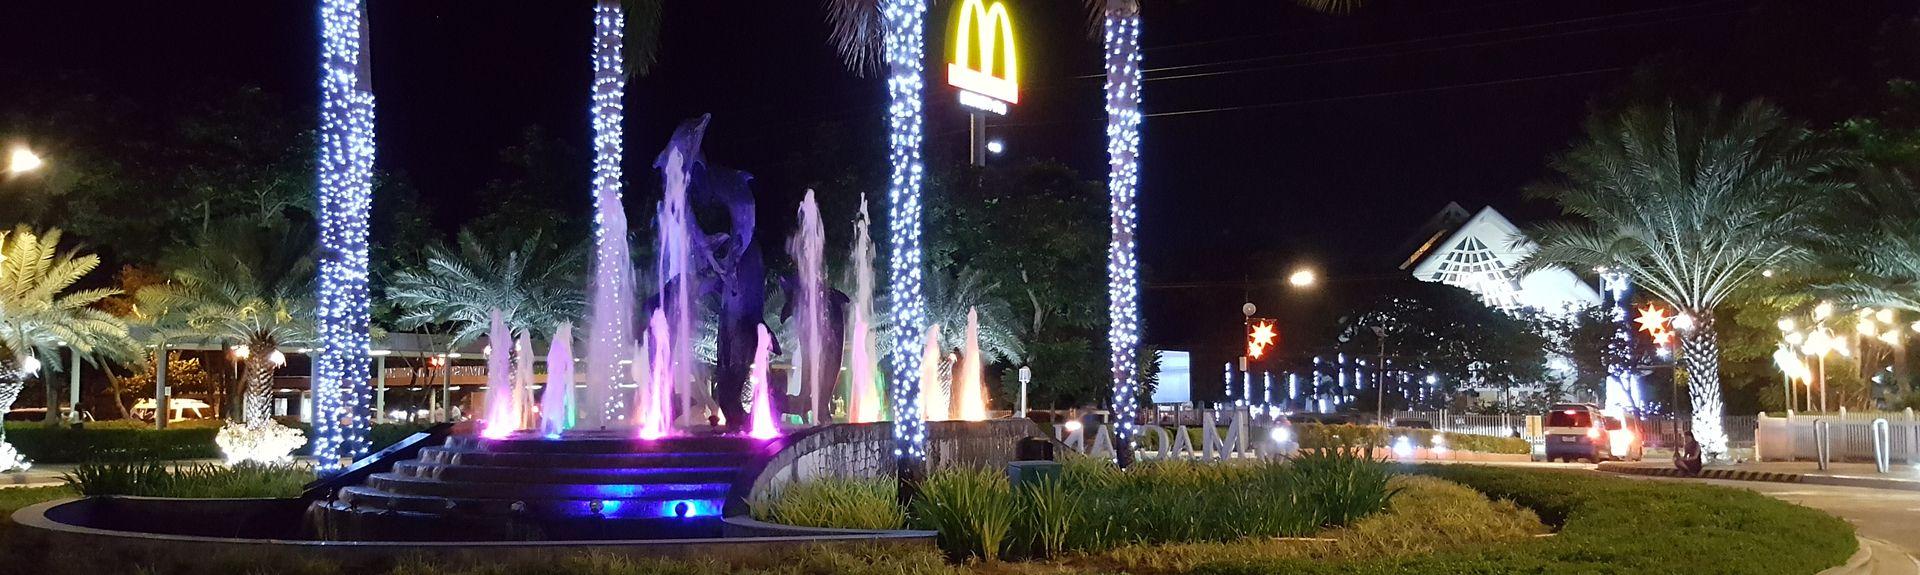 Cordova, Central Visayas, Philippinen